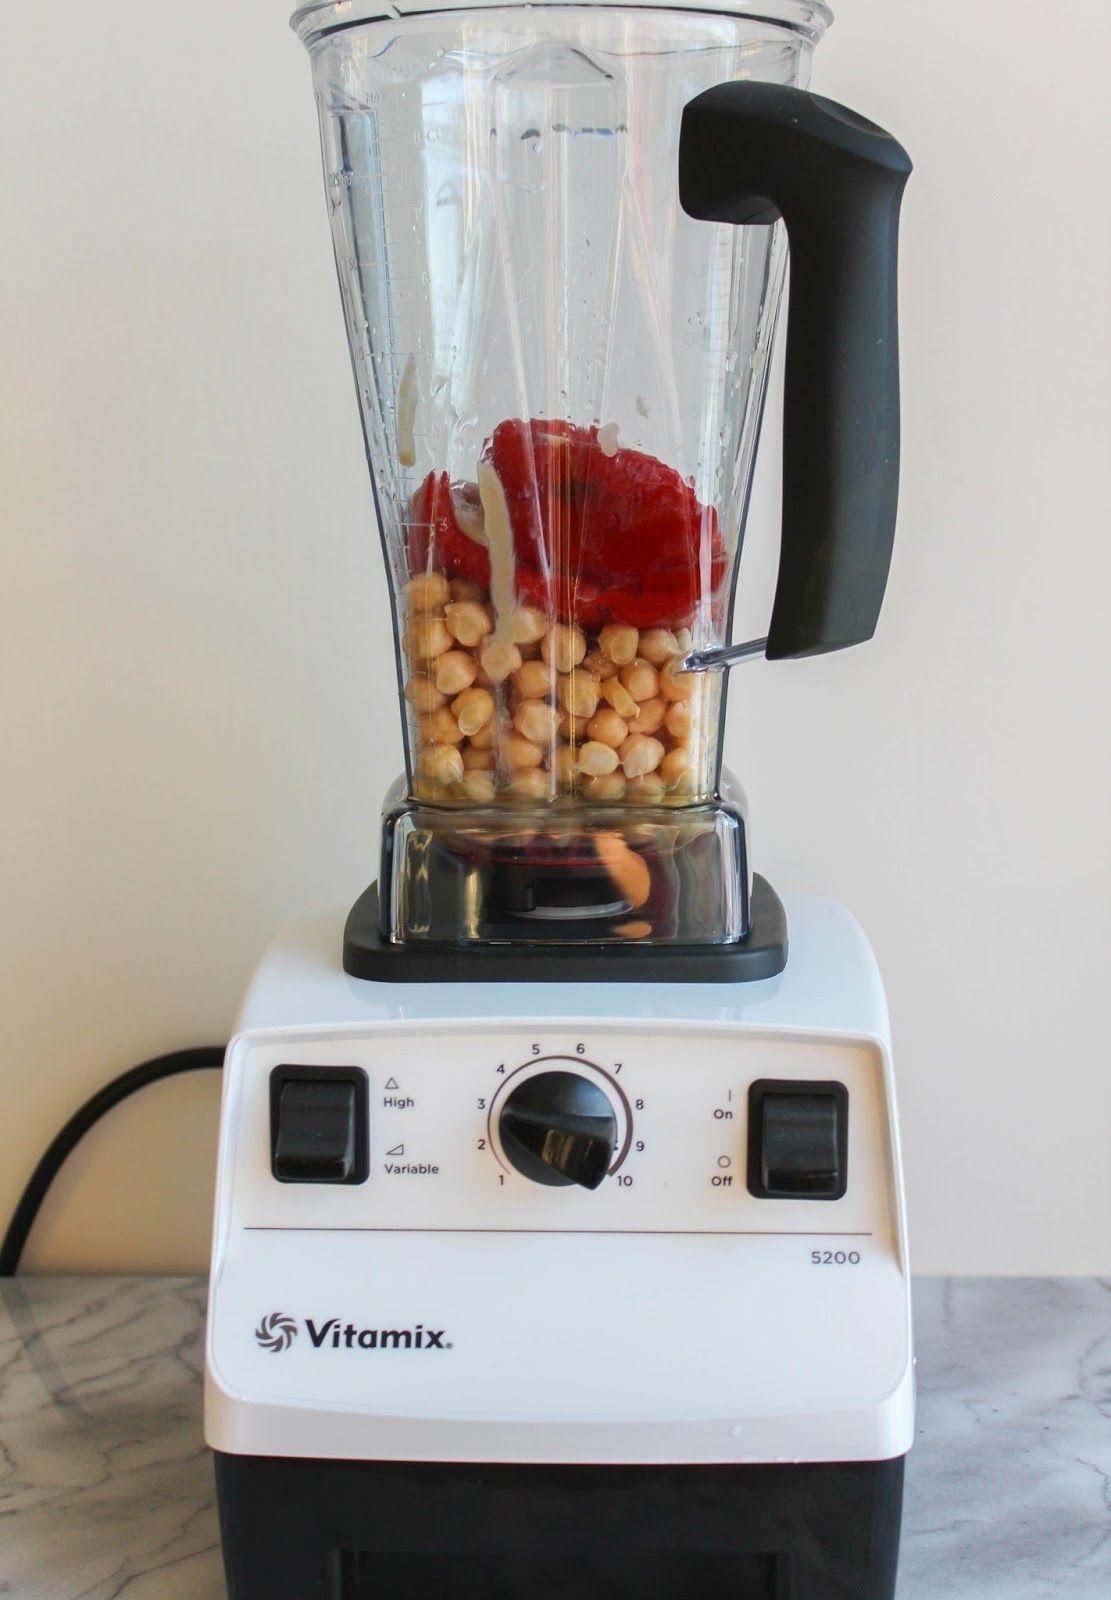 Roasted Red Pepper Hummus Vitamix Recipe Vitamix